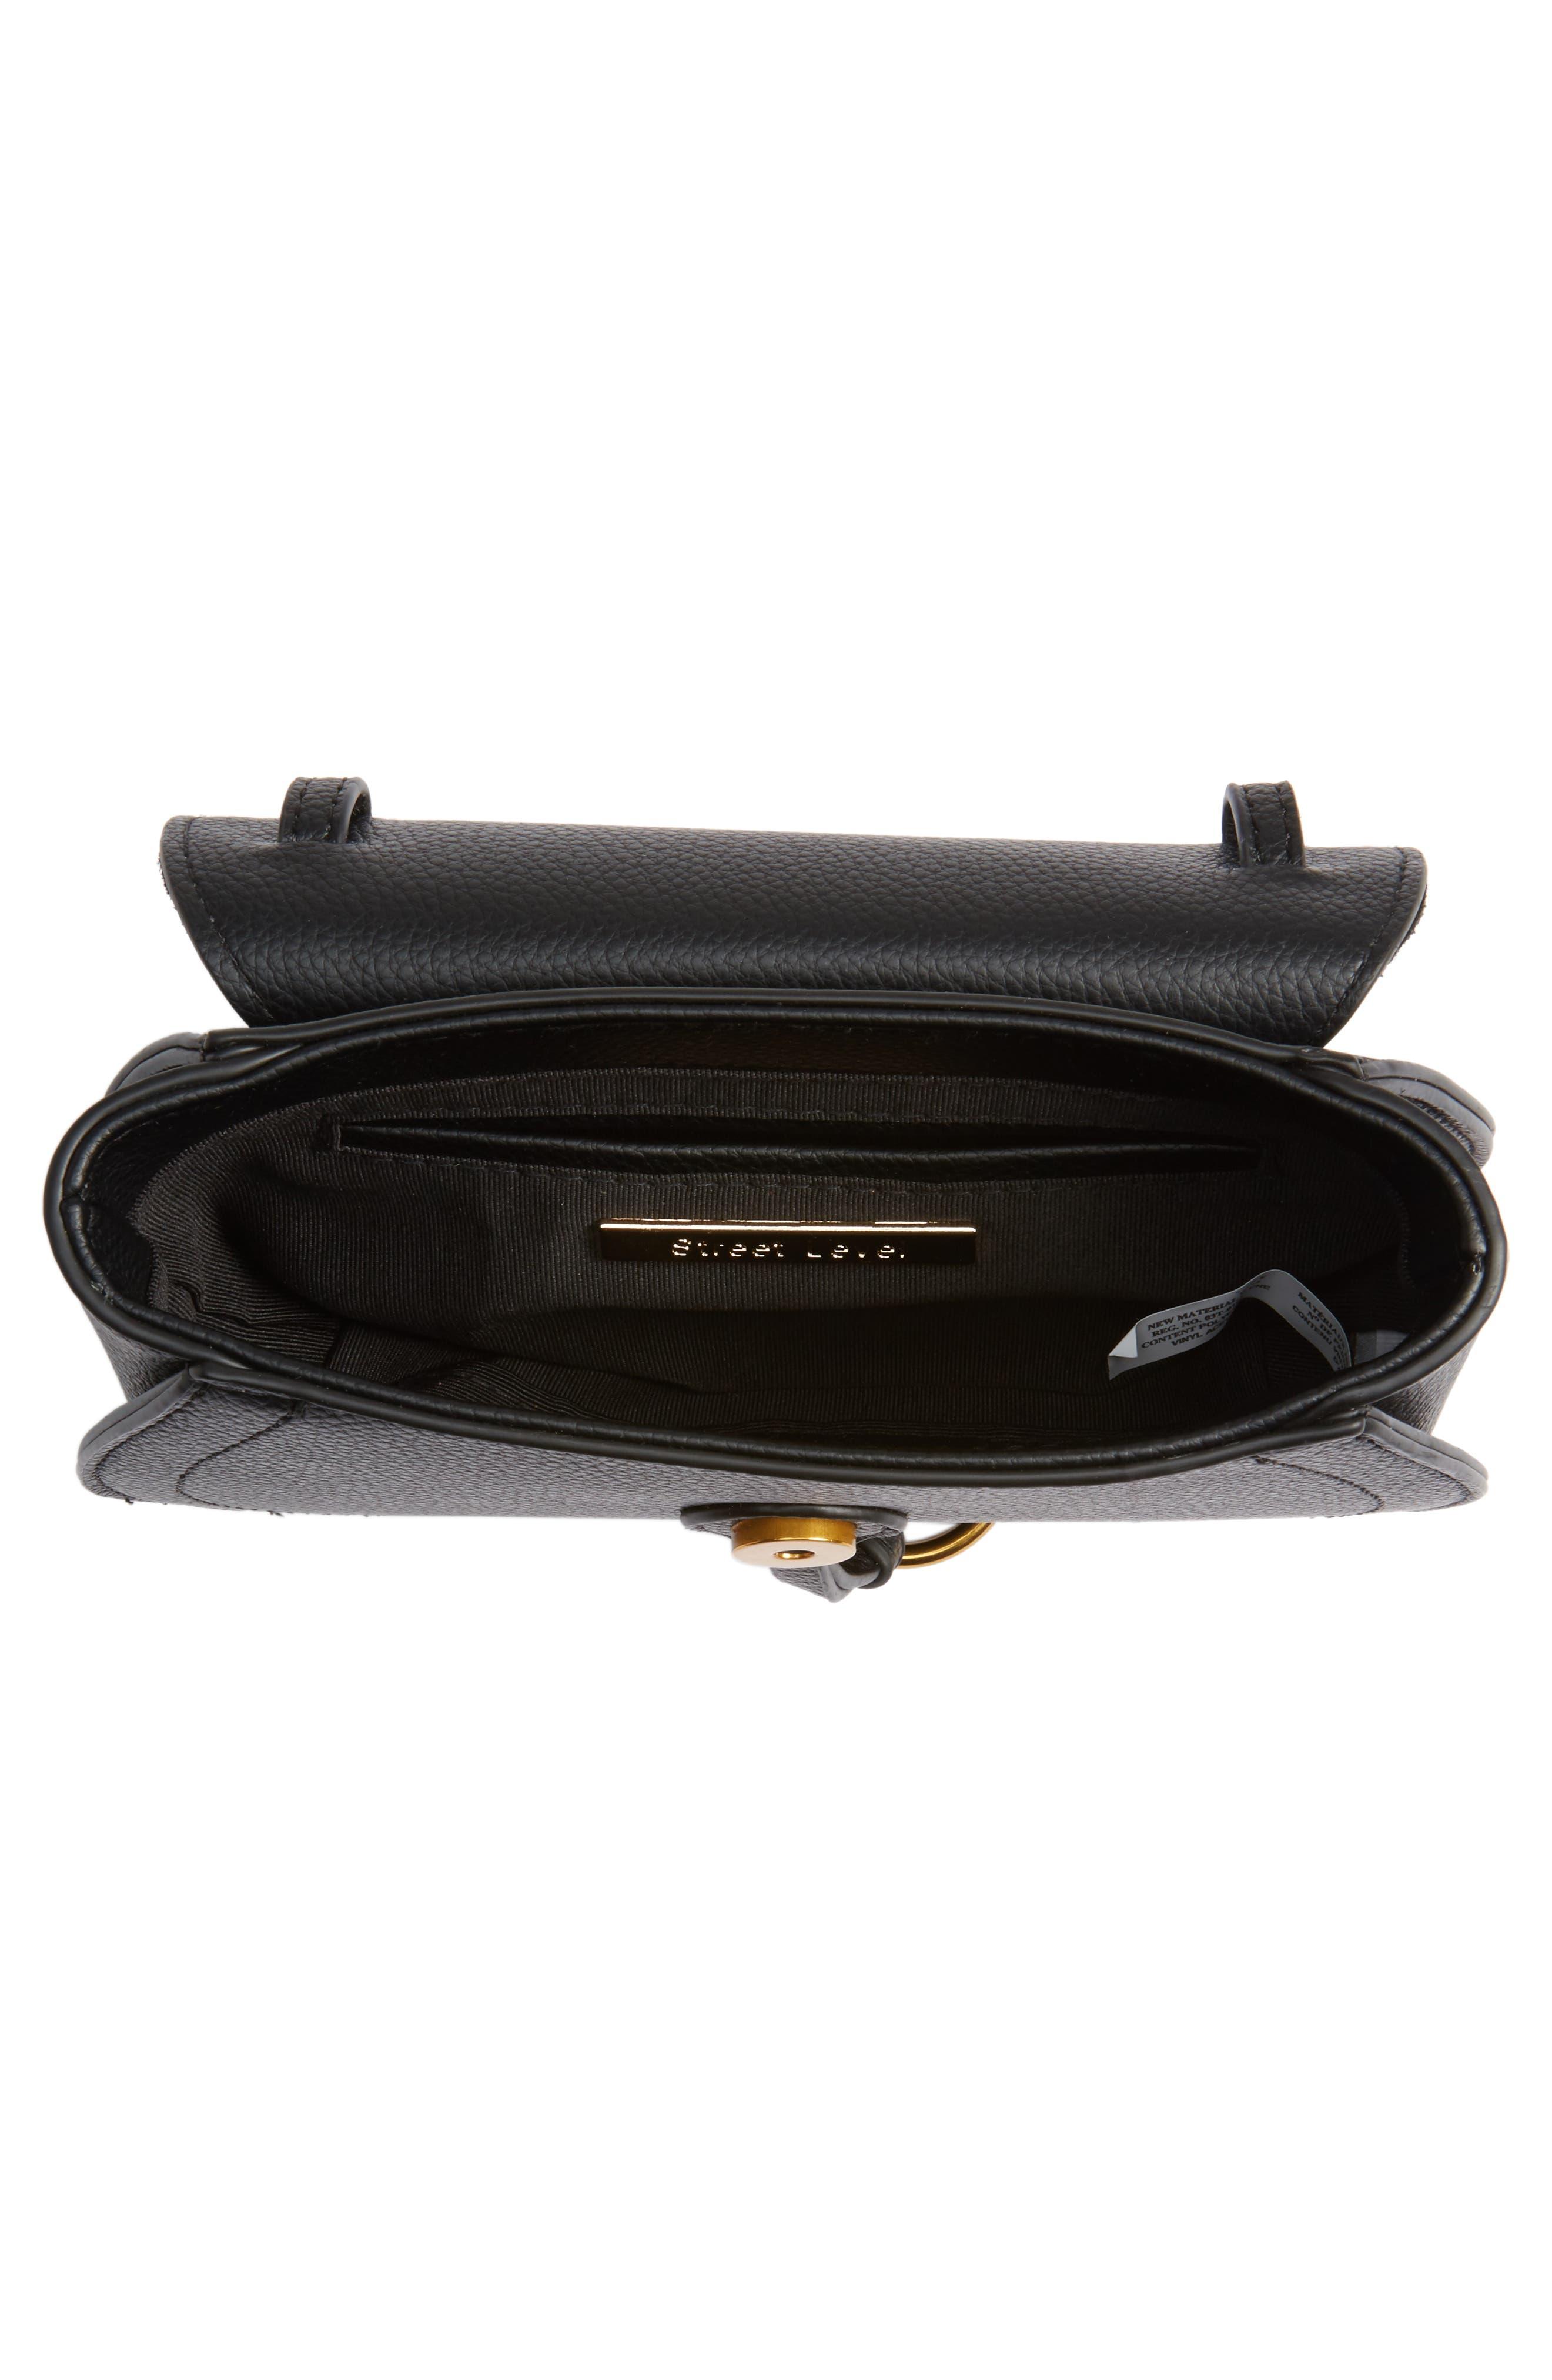 Convertible Crossbody Bag,                             Alternate thumbnail 4, color,                             Black